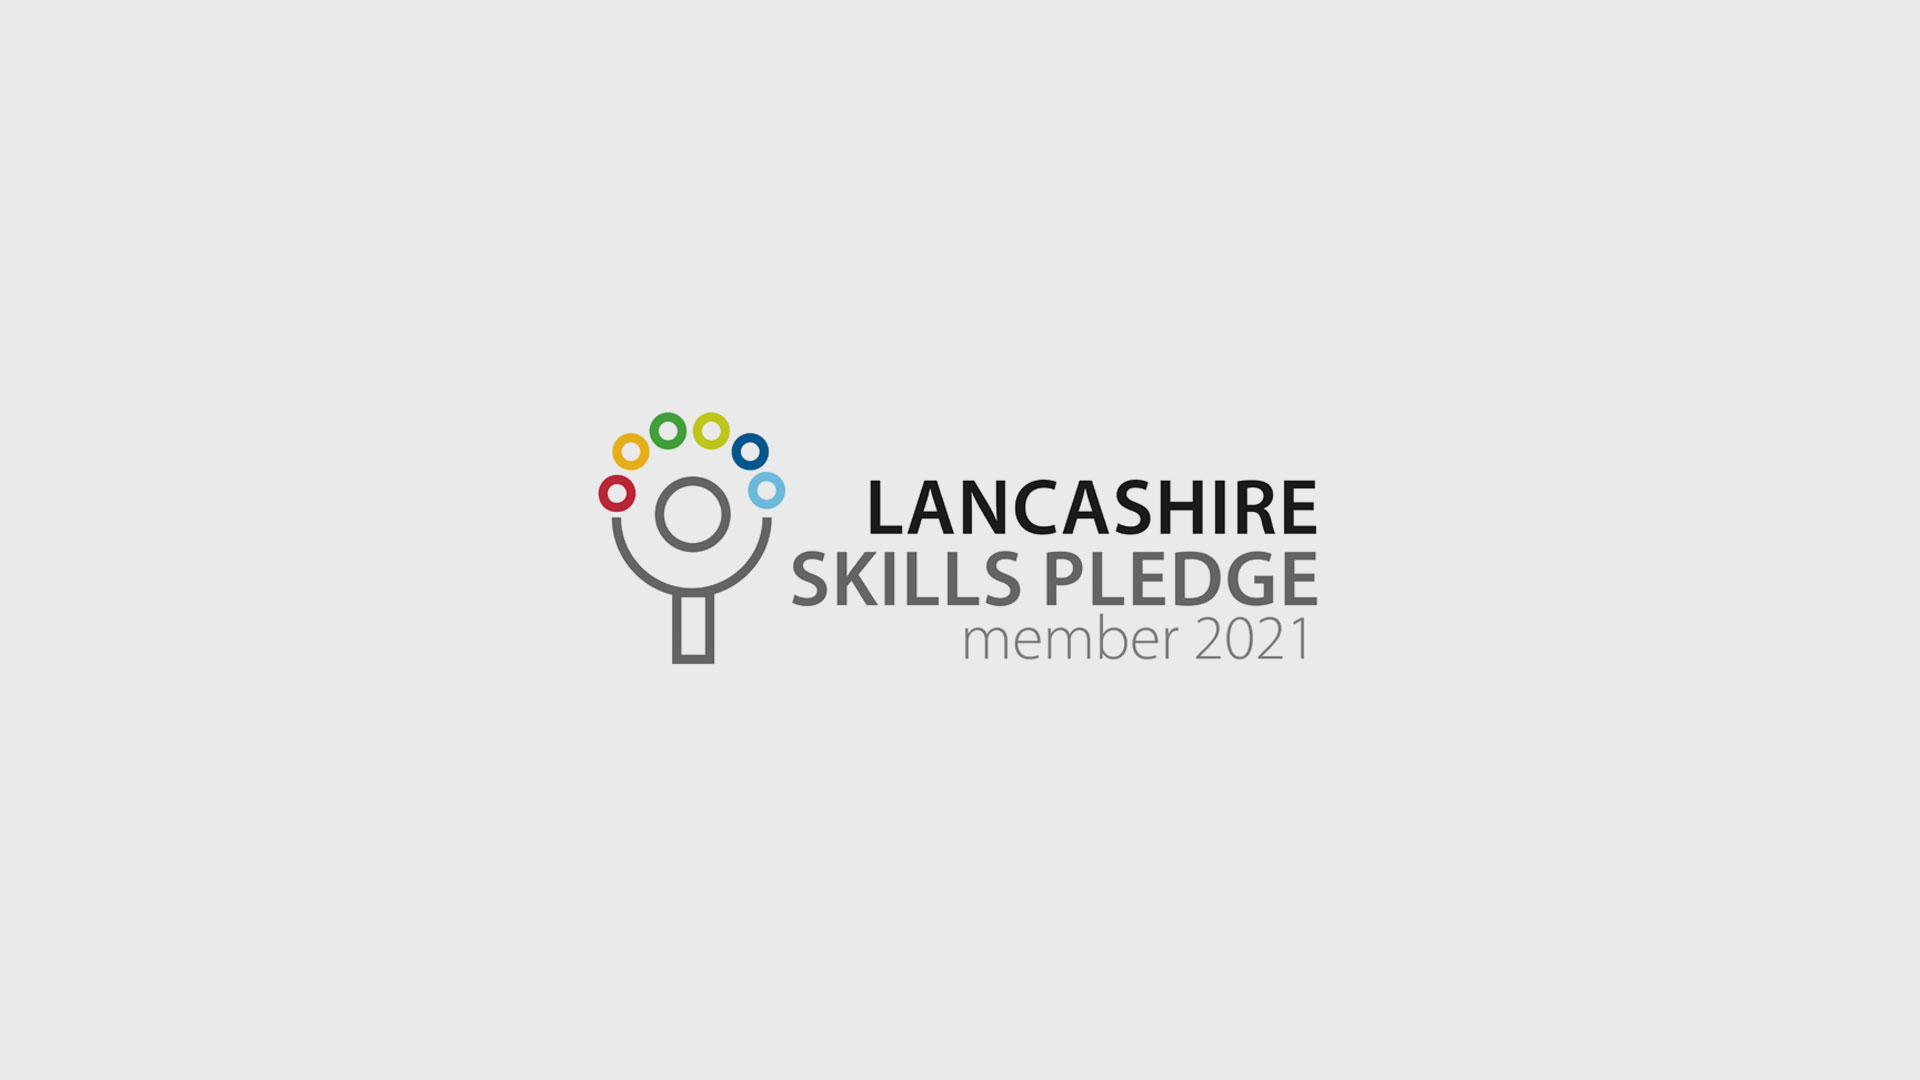 Lancashire Skills Pledge